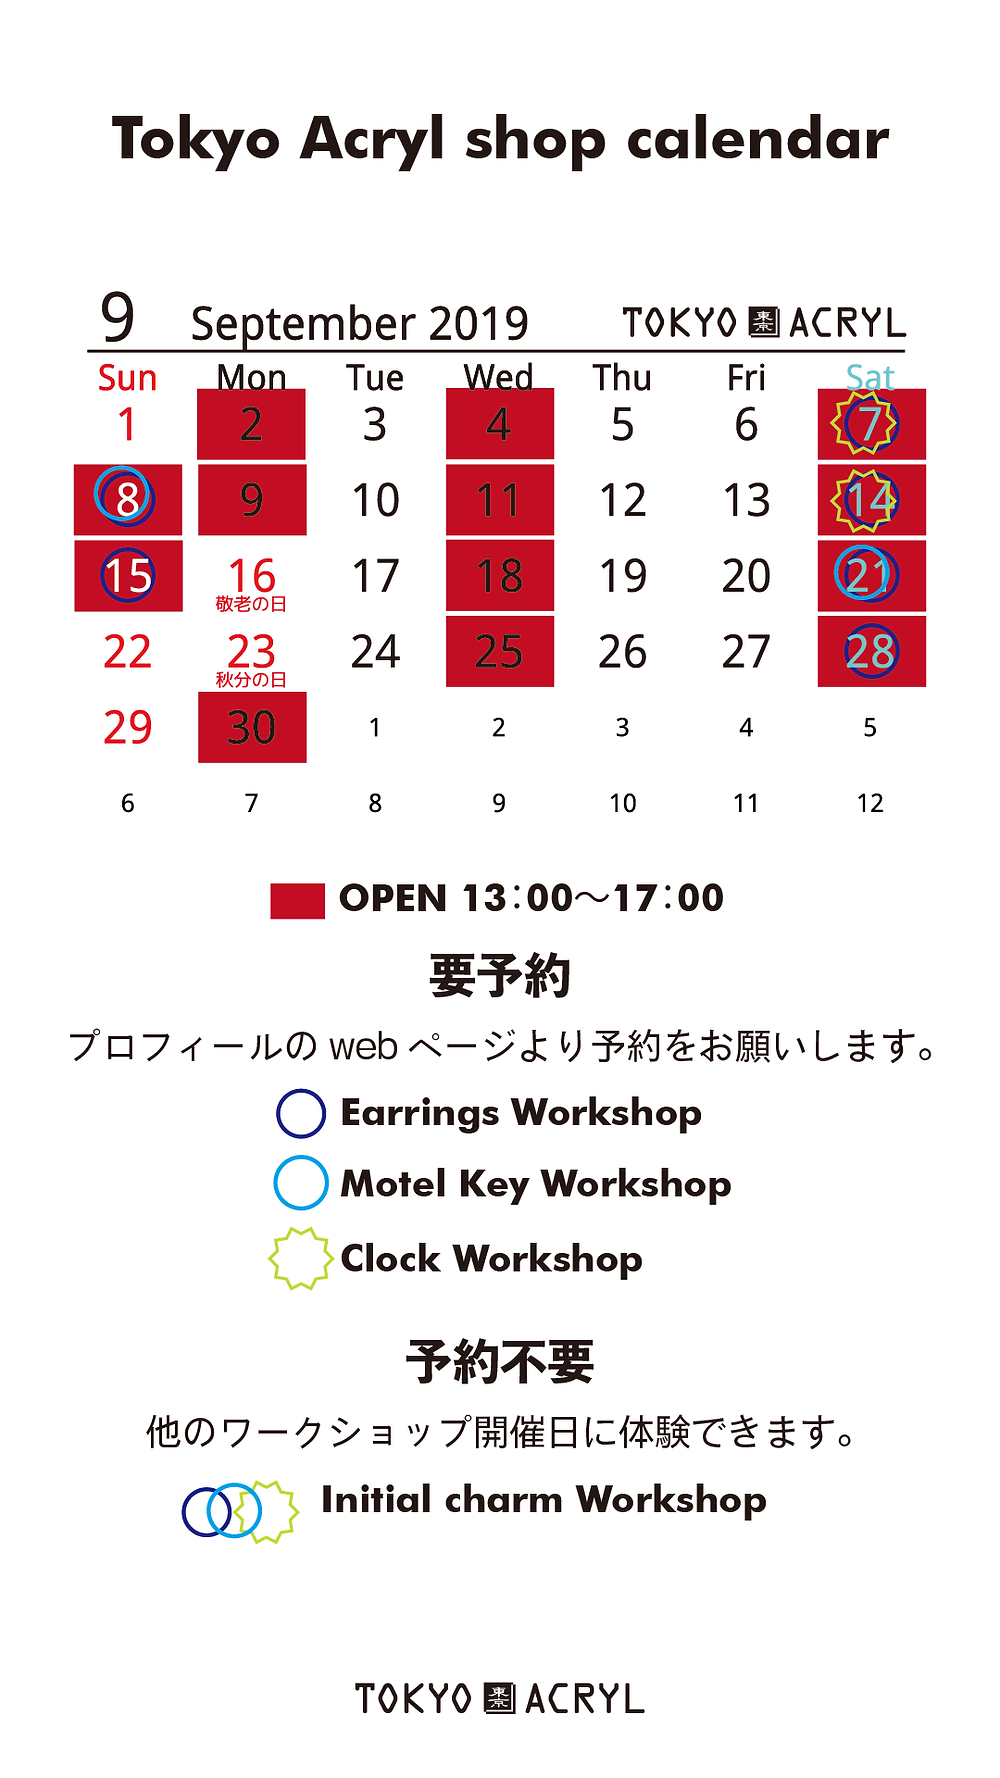 Tokyo Acryl shop calender 2019.9